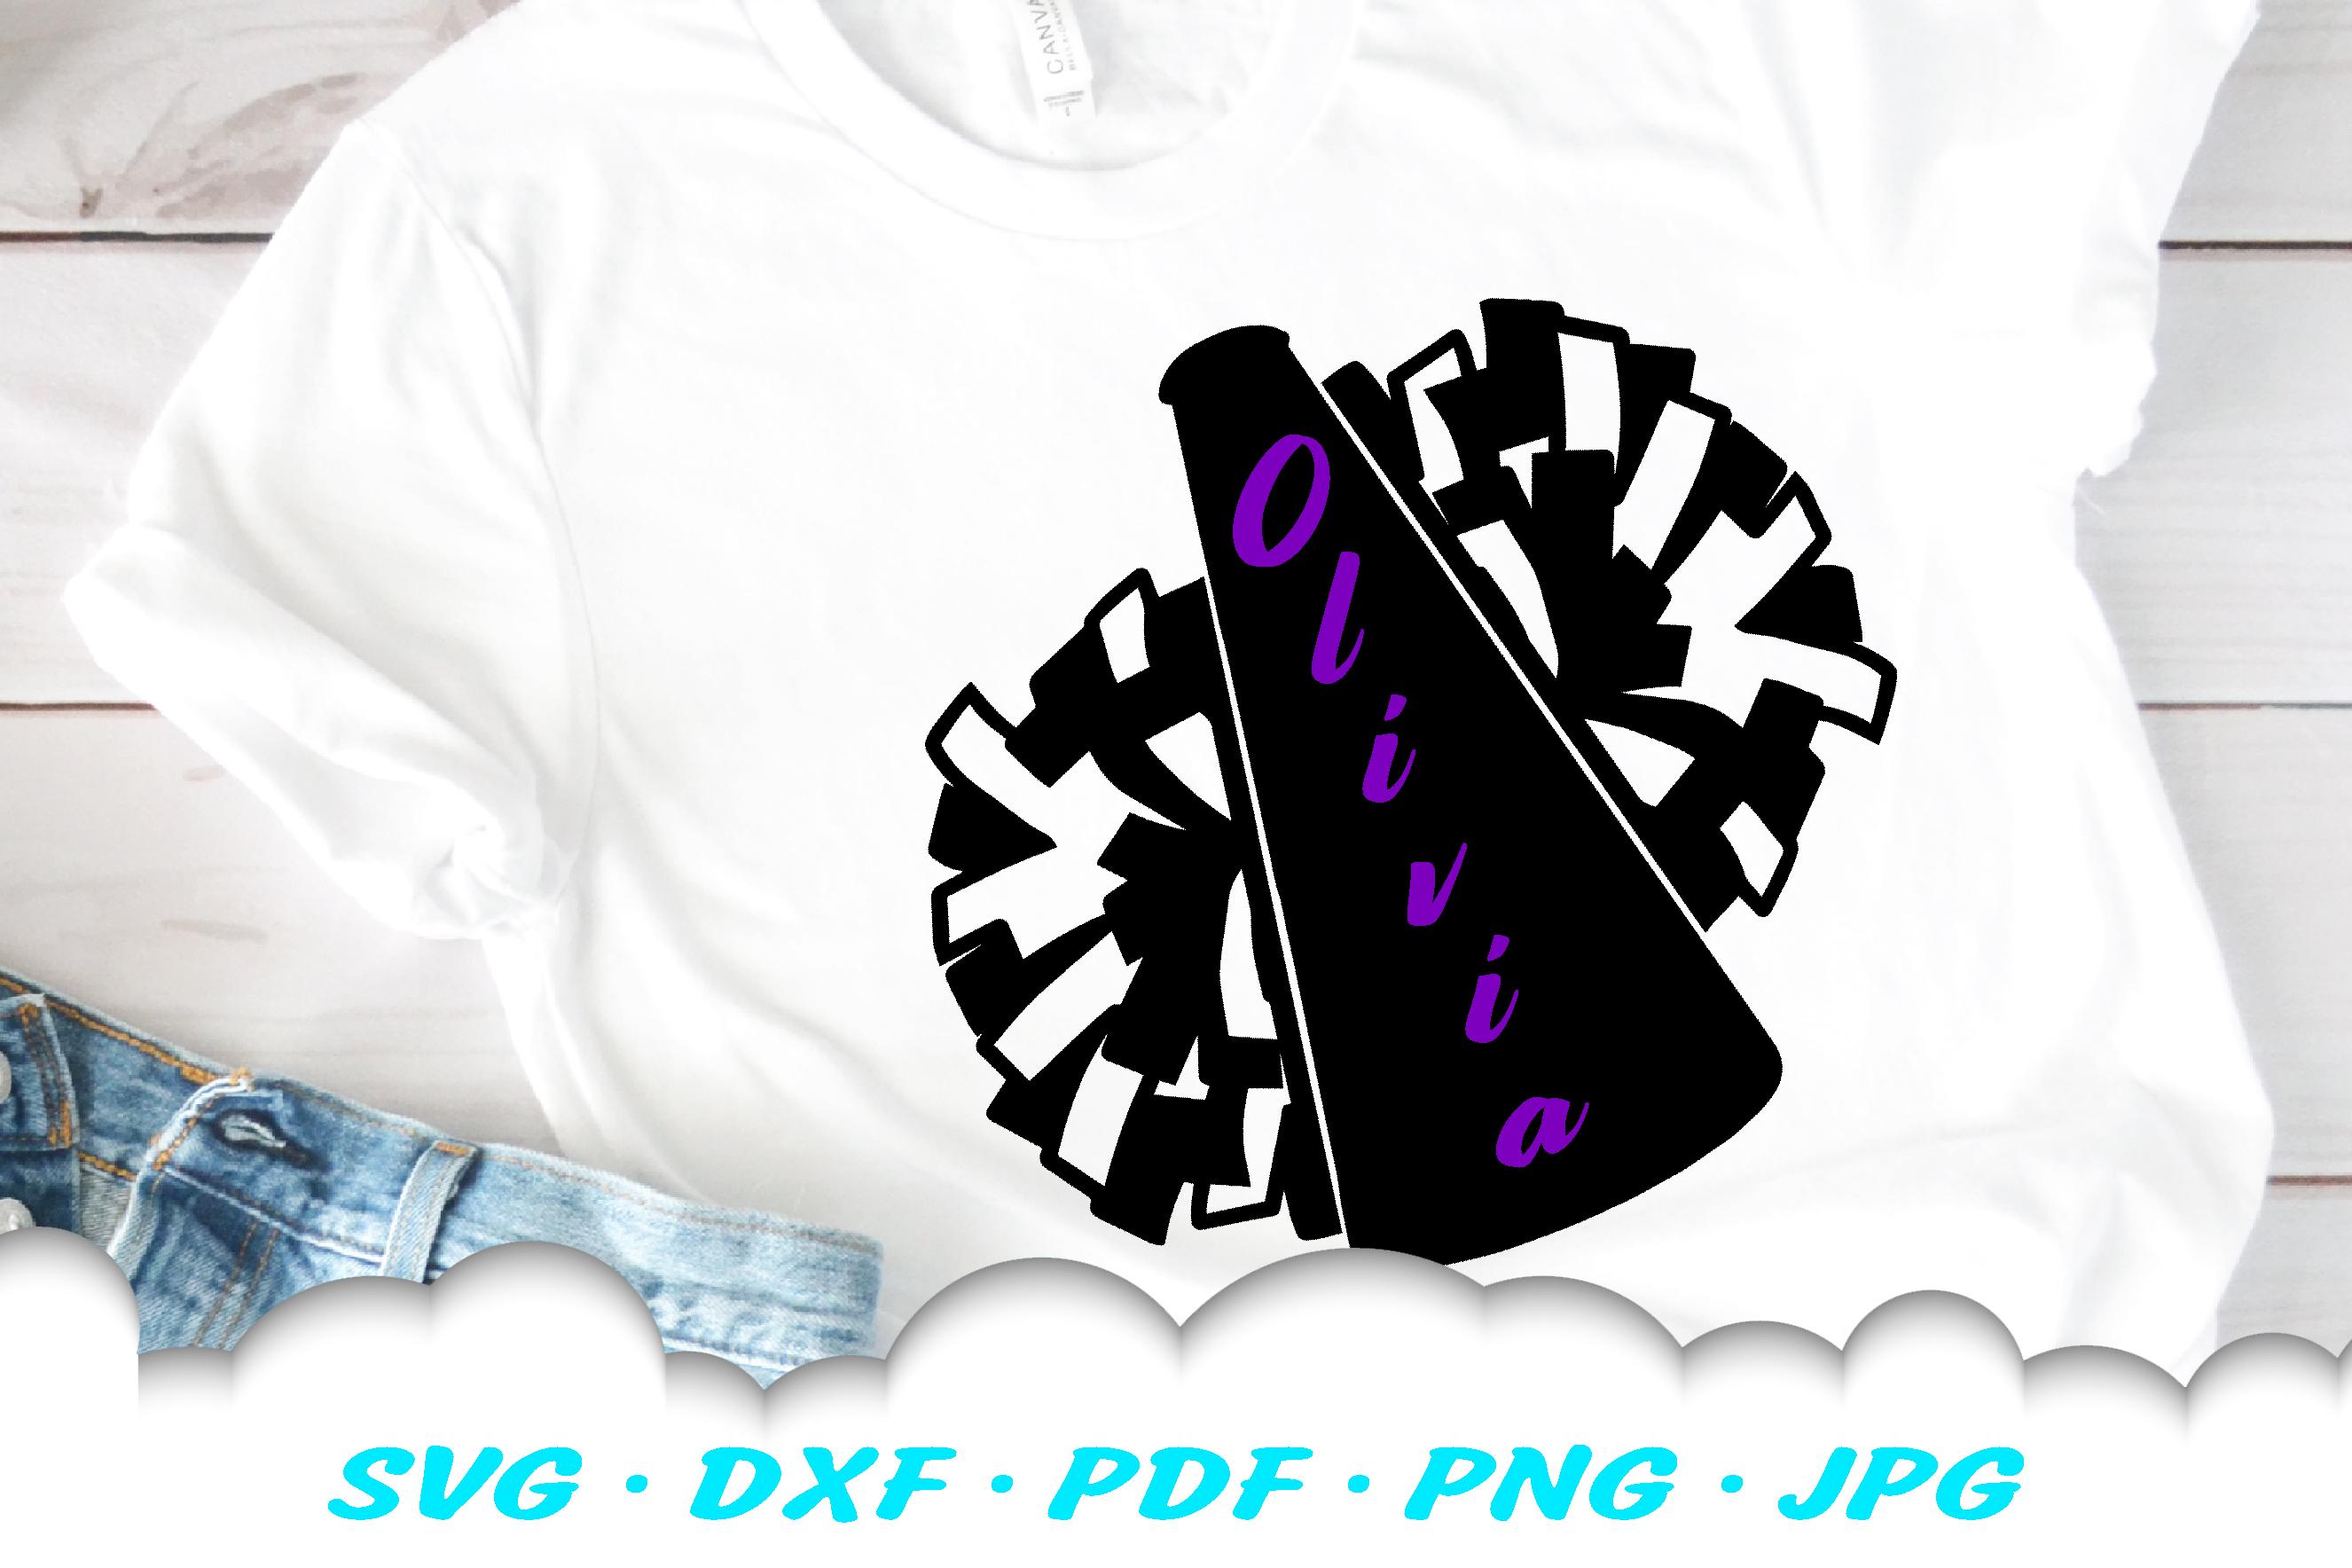 Cheerleader Cheer Megaphone Poms SVG DXF Cut Files example image 3